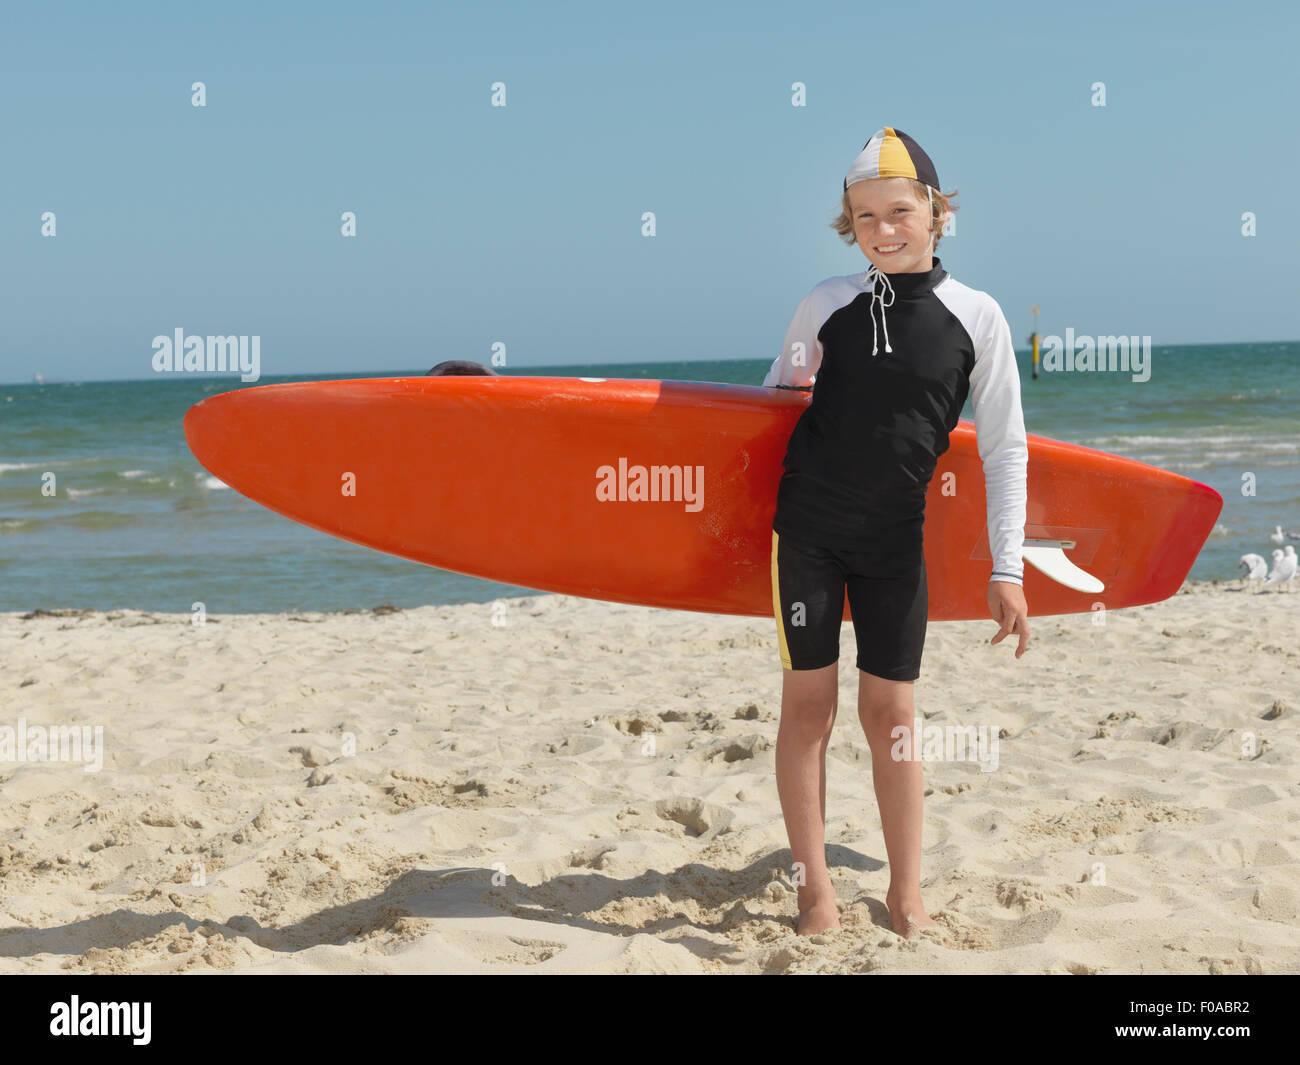 Portrait of confident boy nipper (child surf life savers) carrying surfboard, Altona, Melbourne, Australia - Stock Image